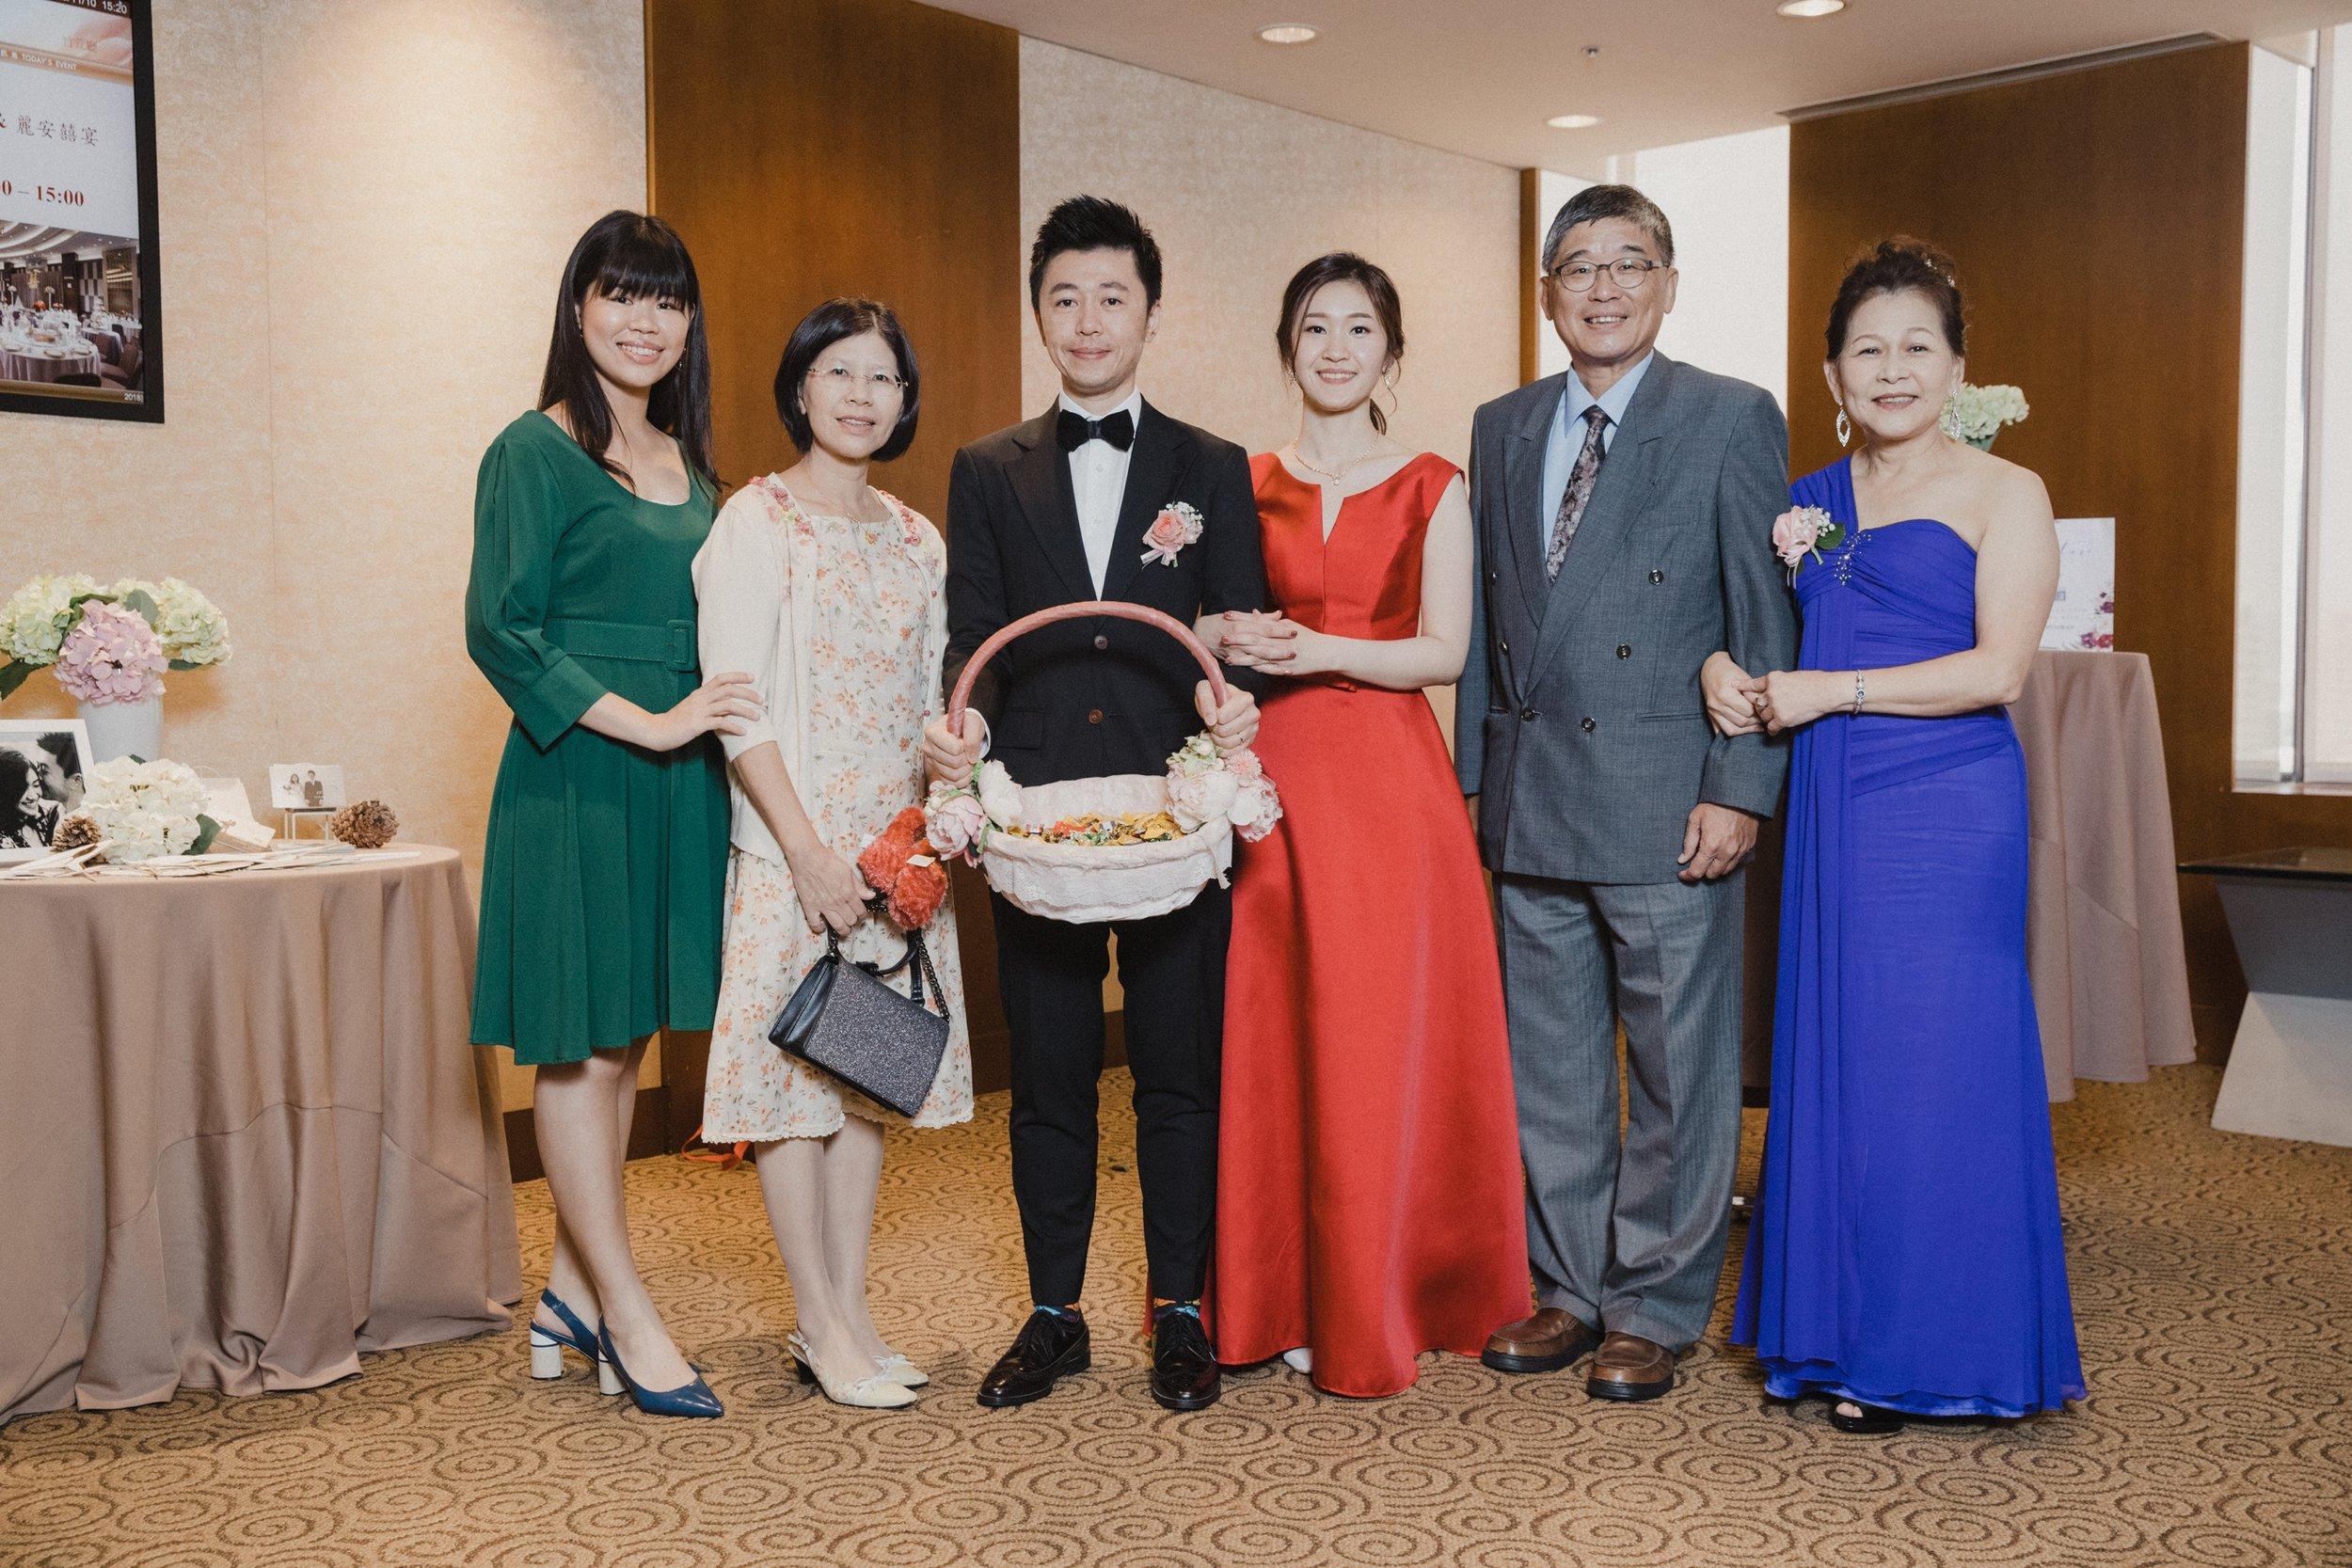 wedding-caridee-oscar-lunch-ambassador-hsinchu-結婚午宴-新竹國賓_155.jpg